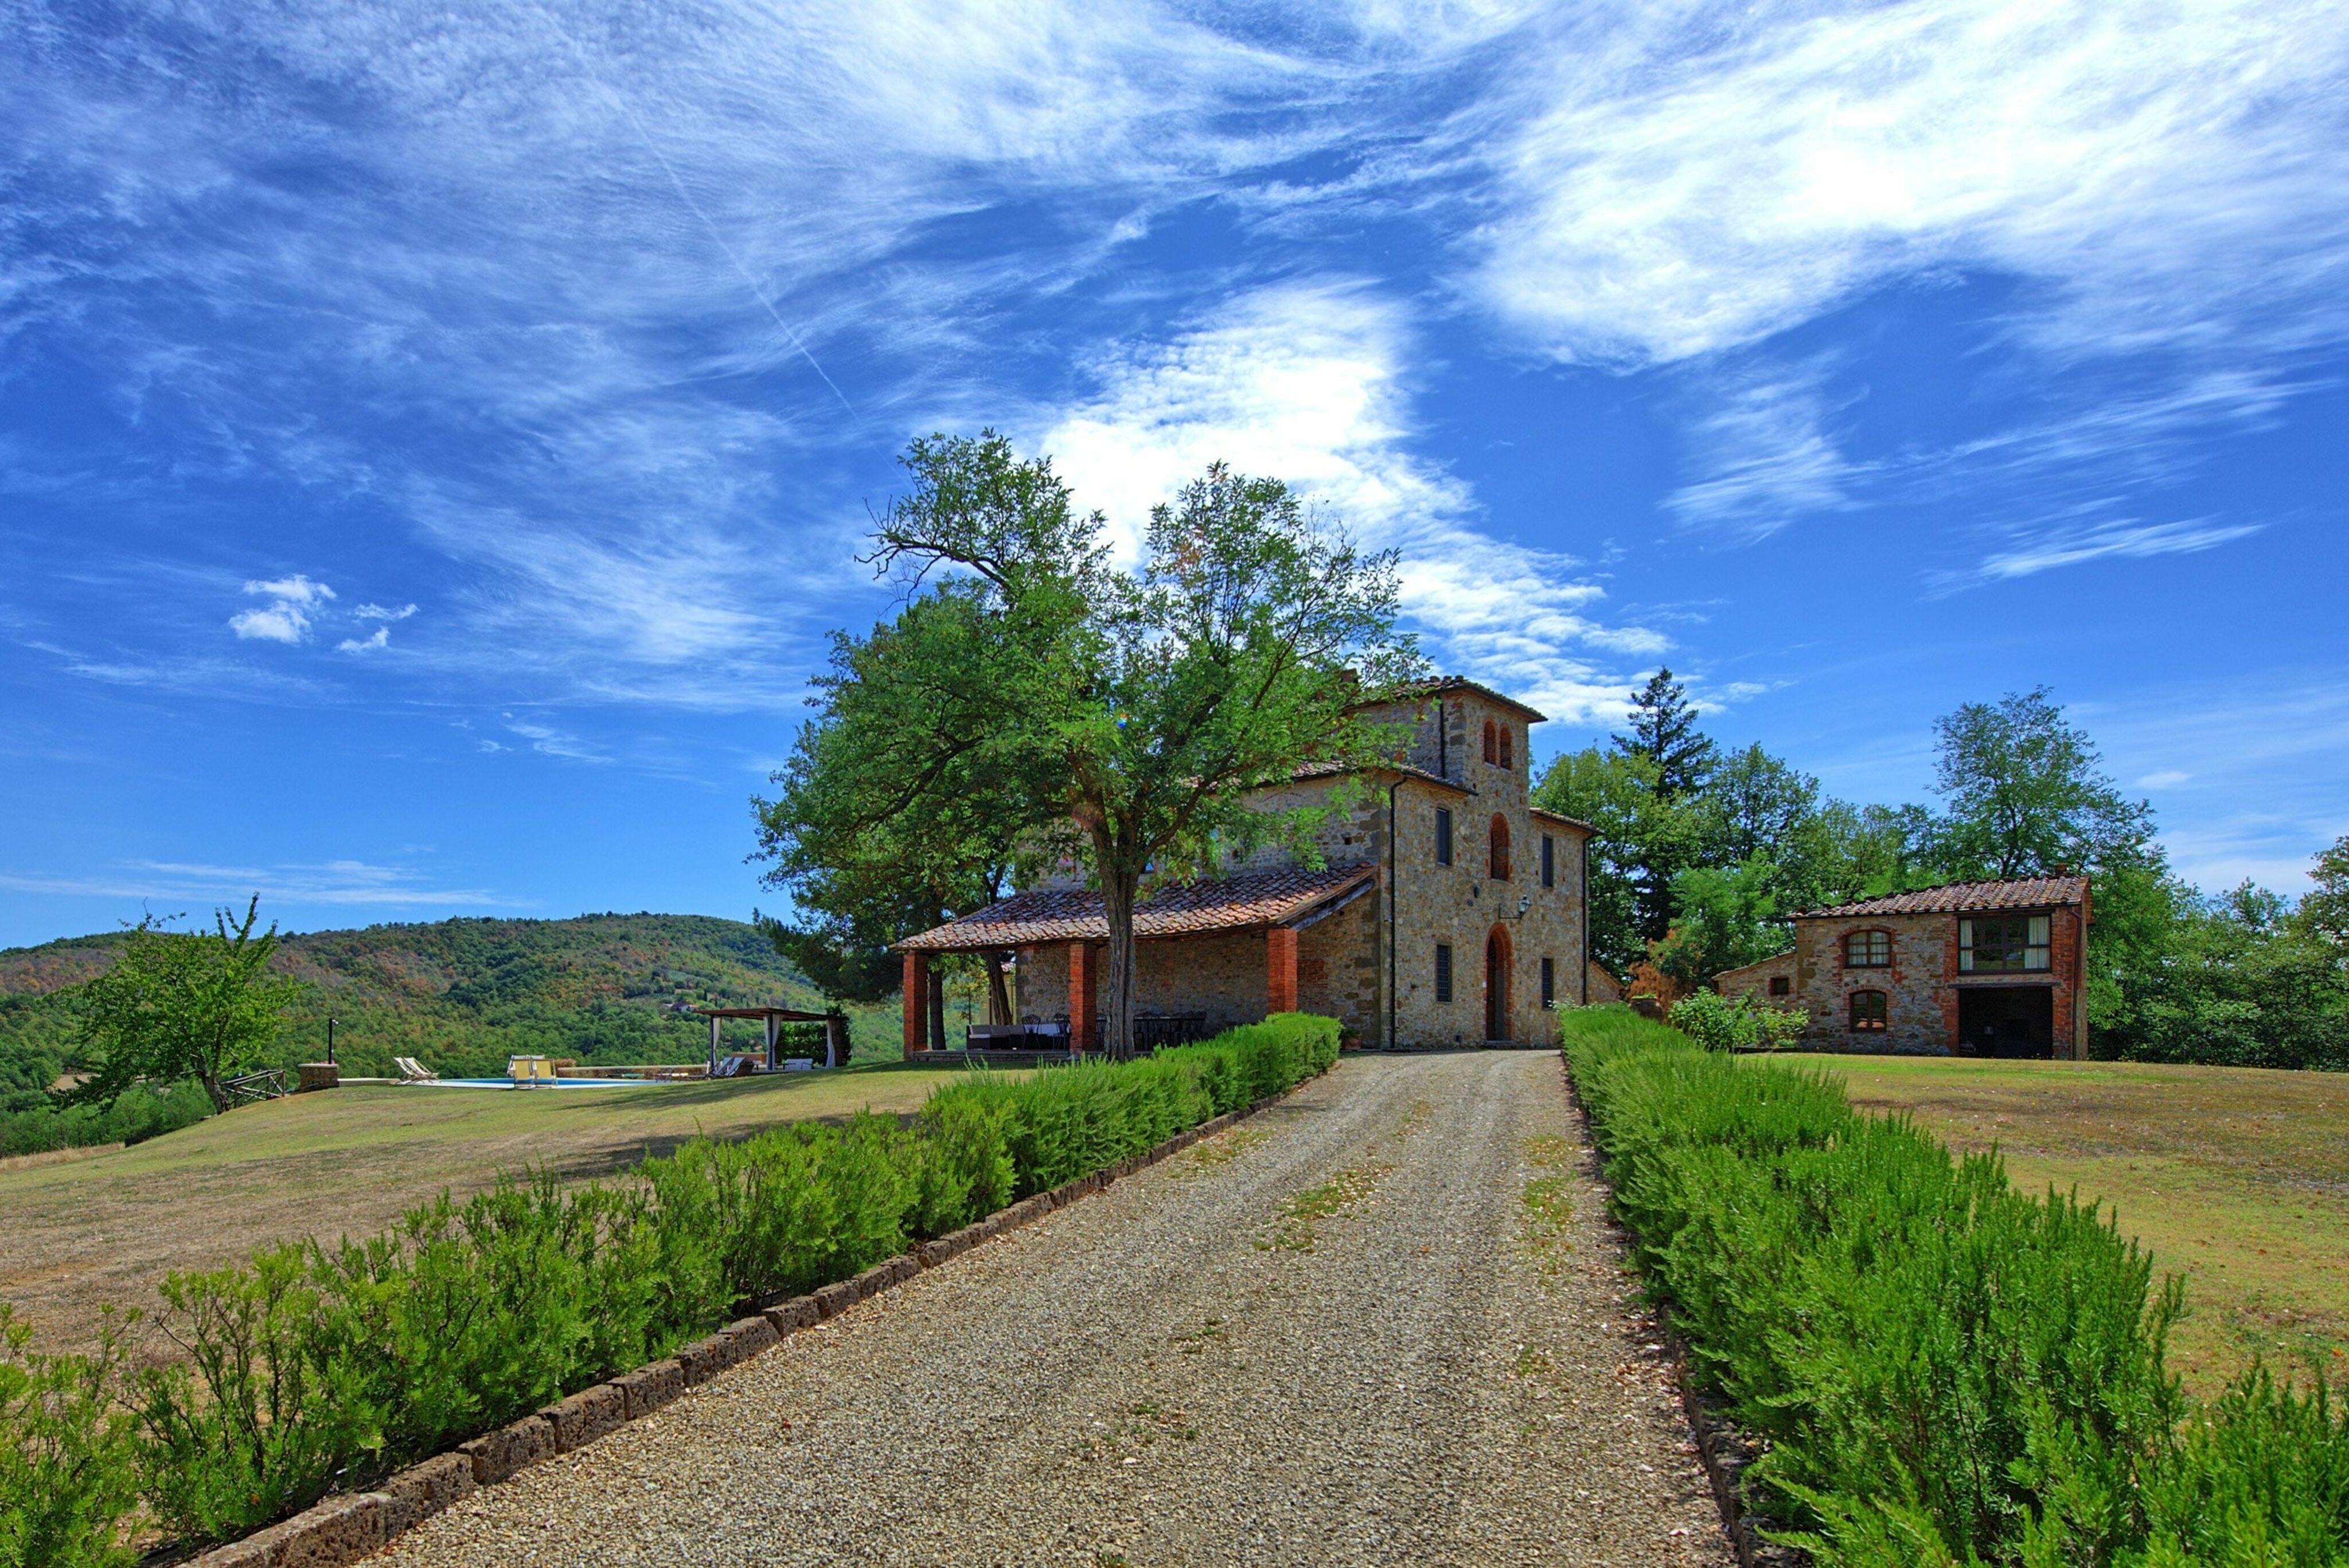 Villa Fabbriimage 32